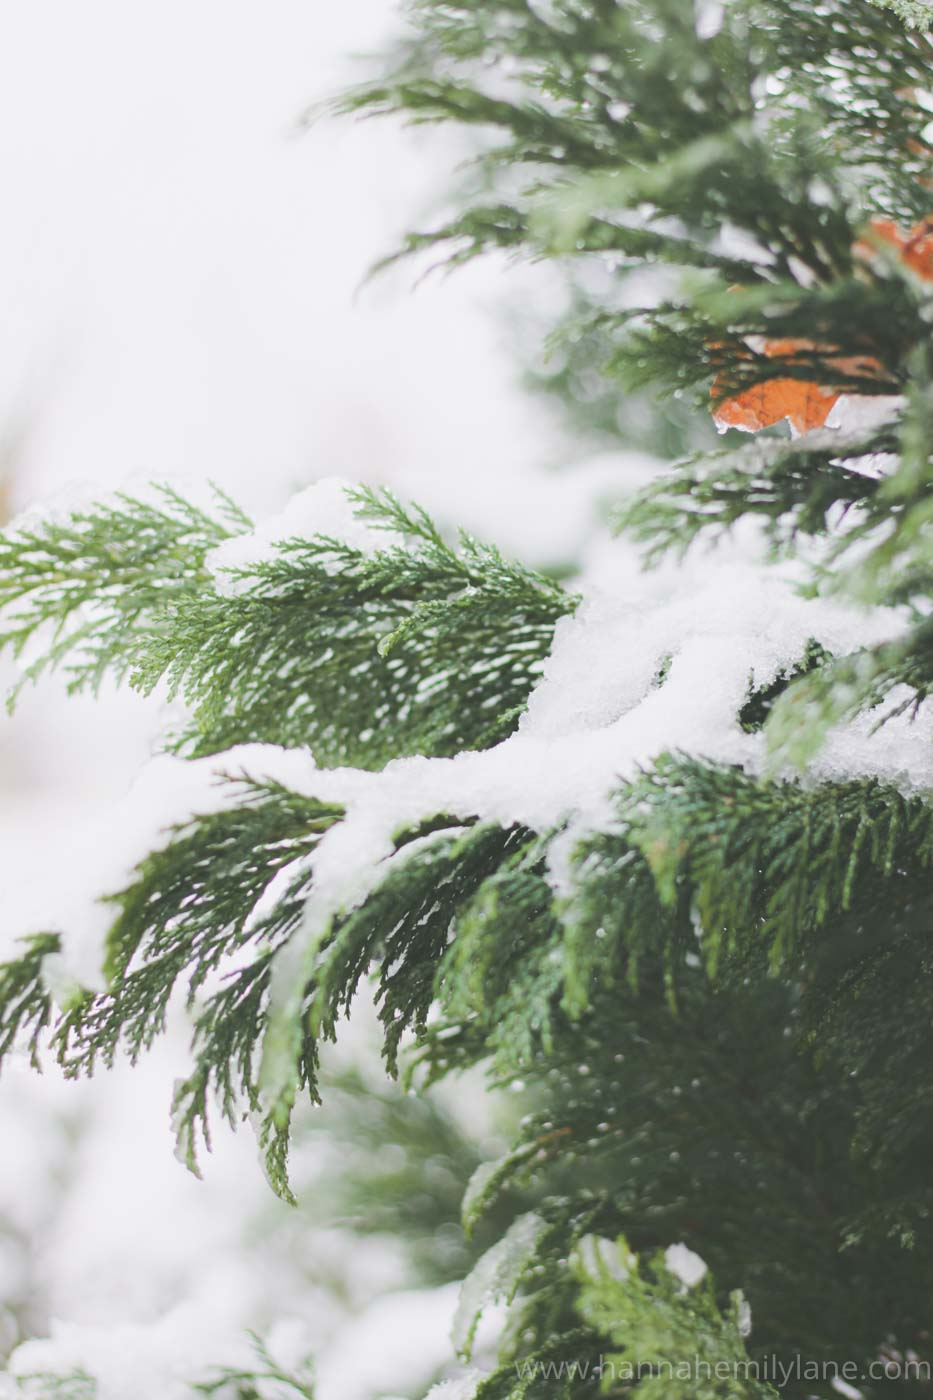 How To Self Care in Winter | www.hannahemilylane.com